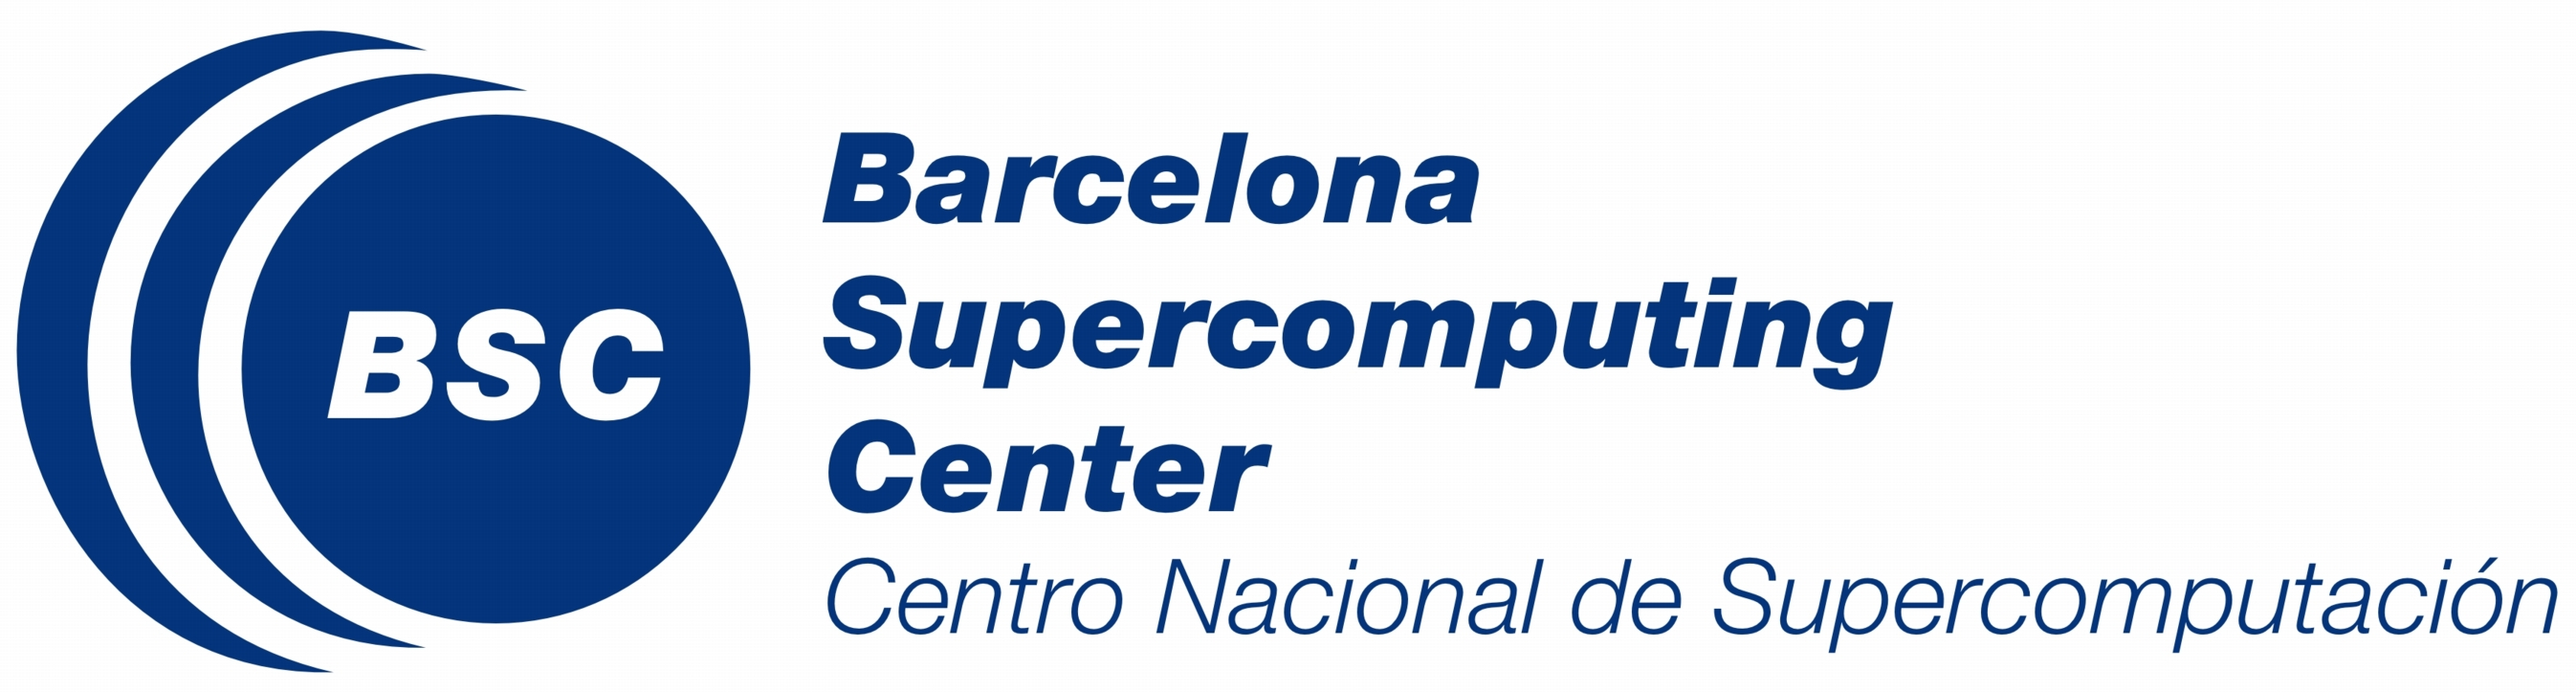 BSC-logo 1.jpg